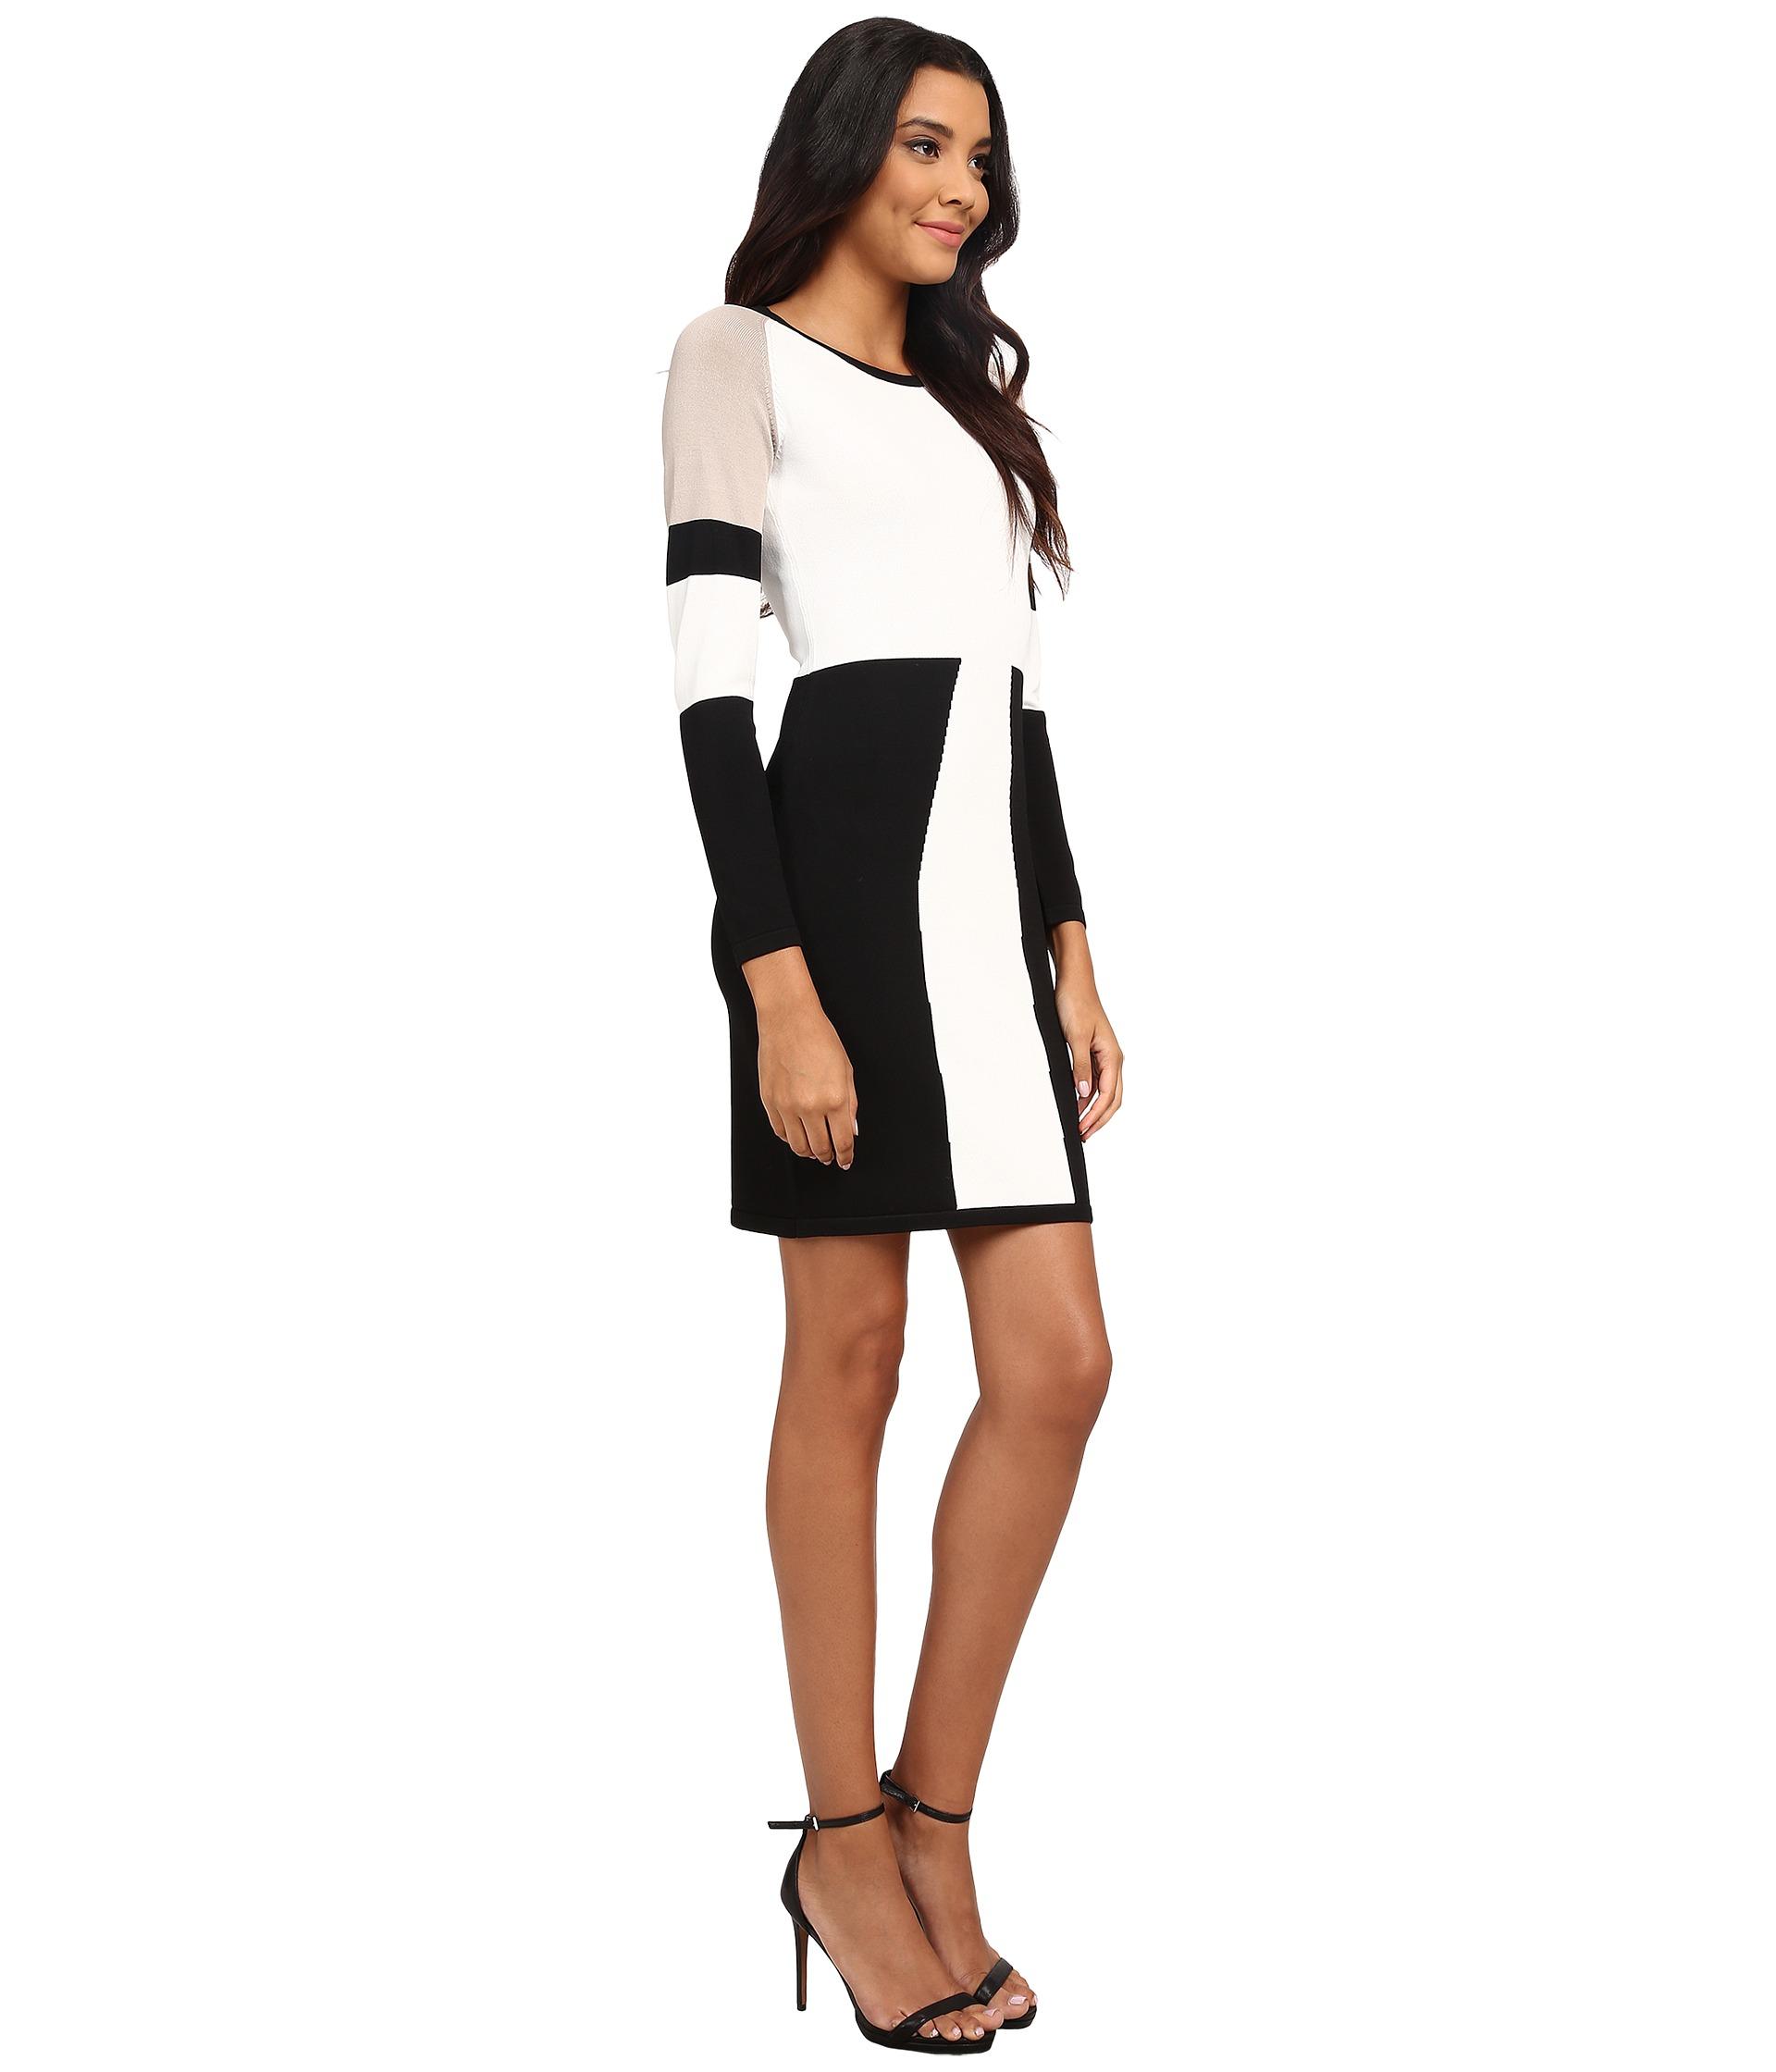 Color Block Dress Calvin In Sweater Klein Natural Lyst QBoCrsthdx